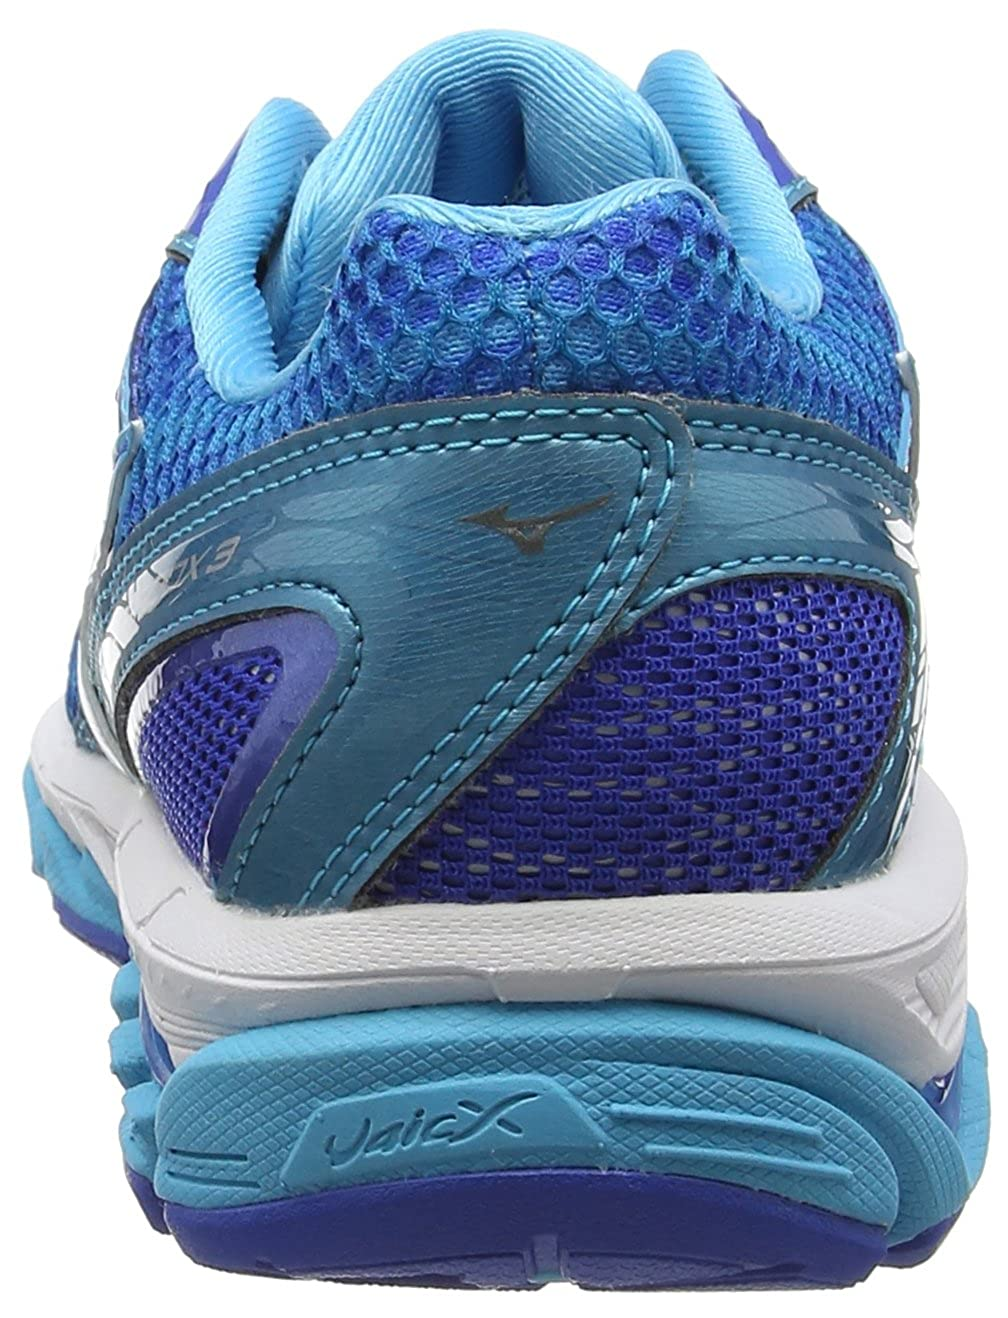 Chaussures de Running Comp/étition Femme W Mizuno Wave Paradox 3